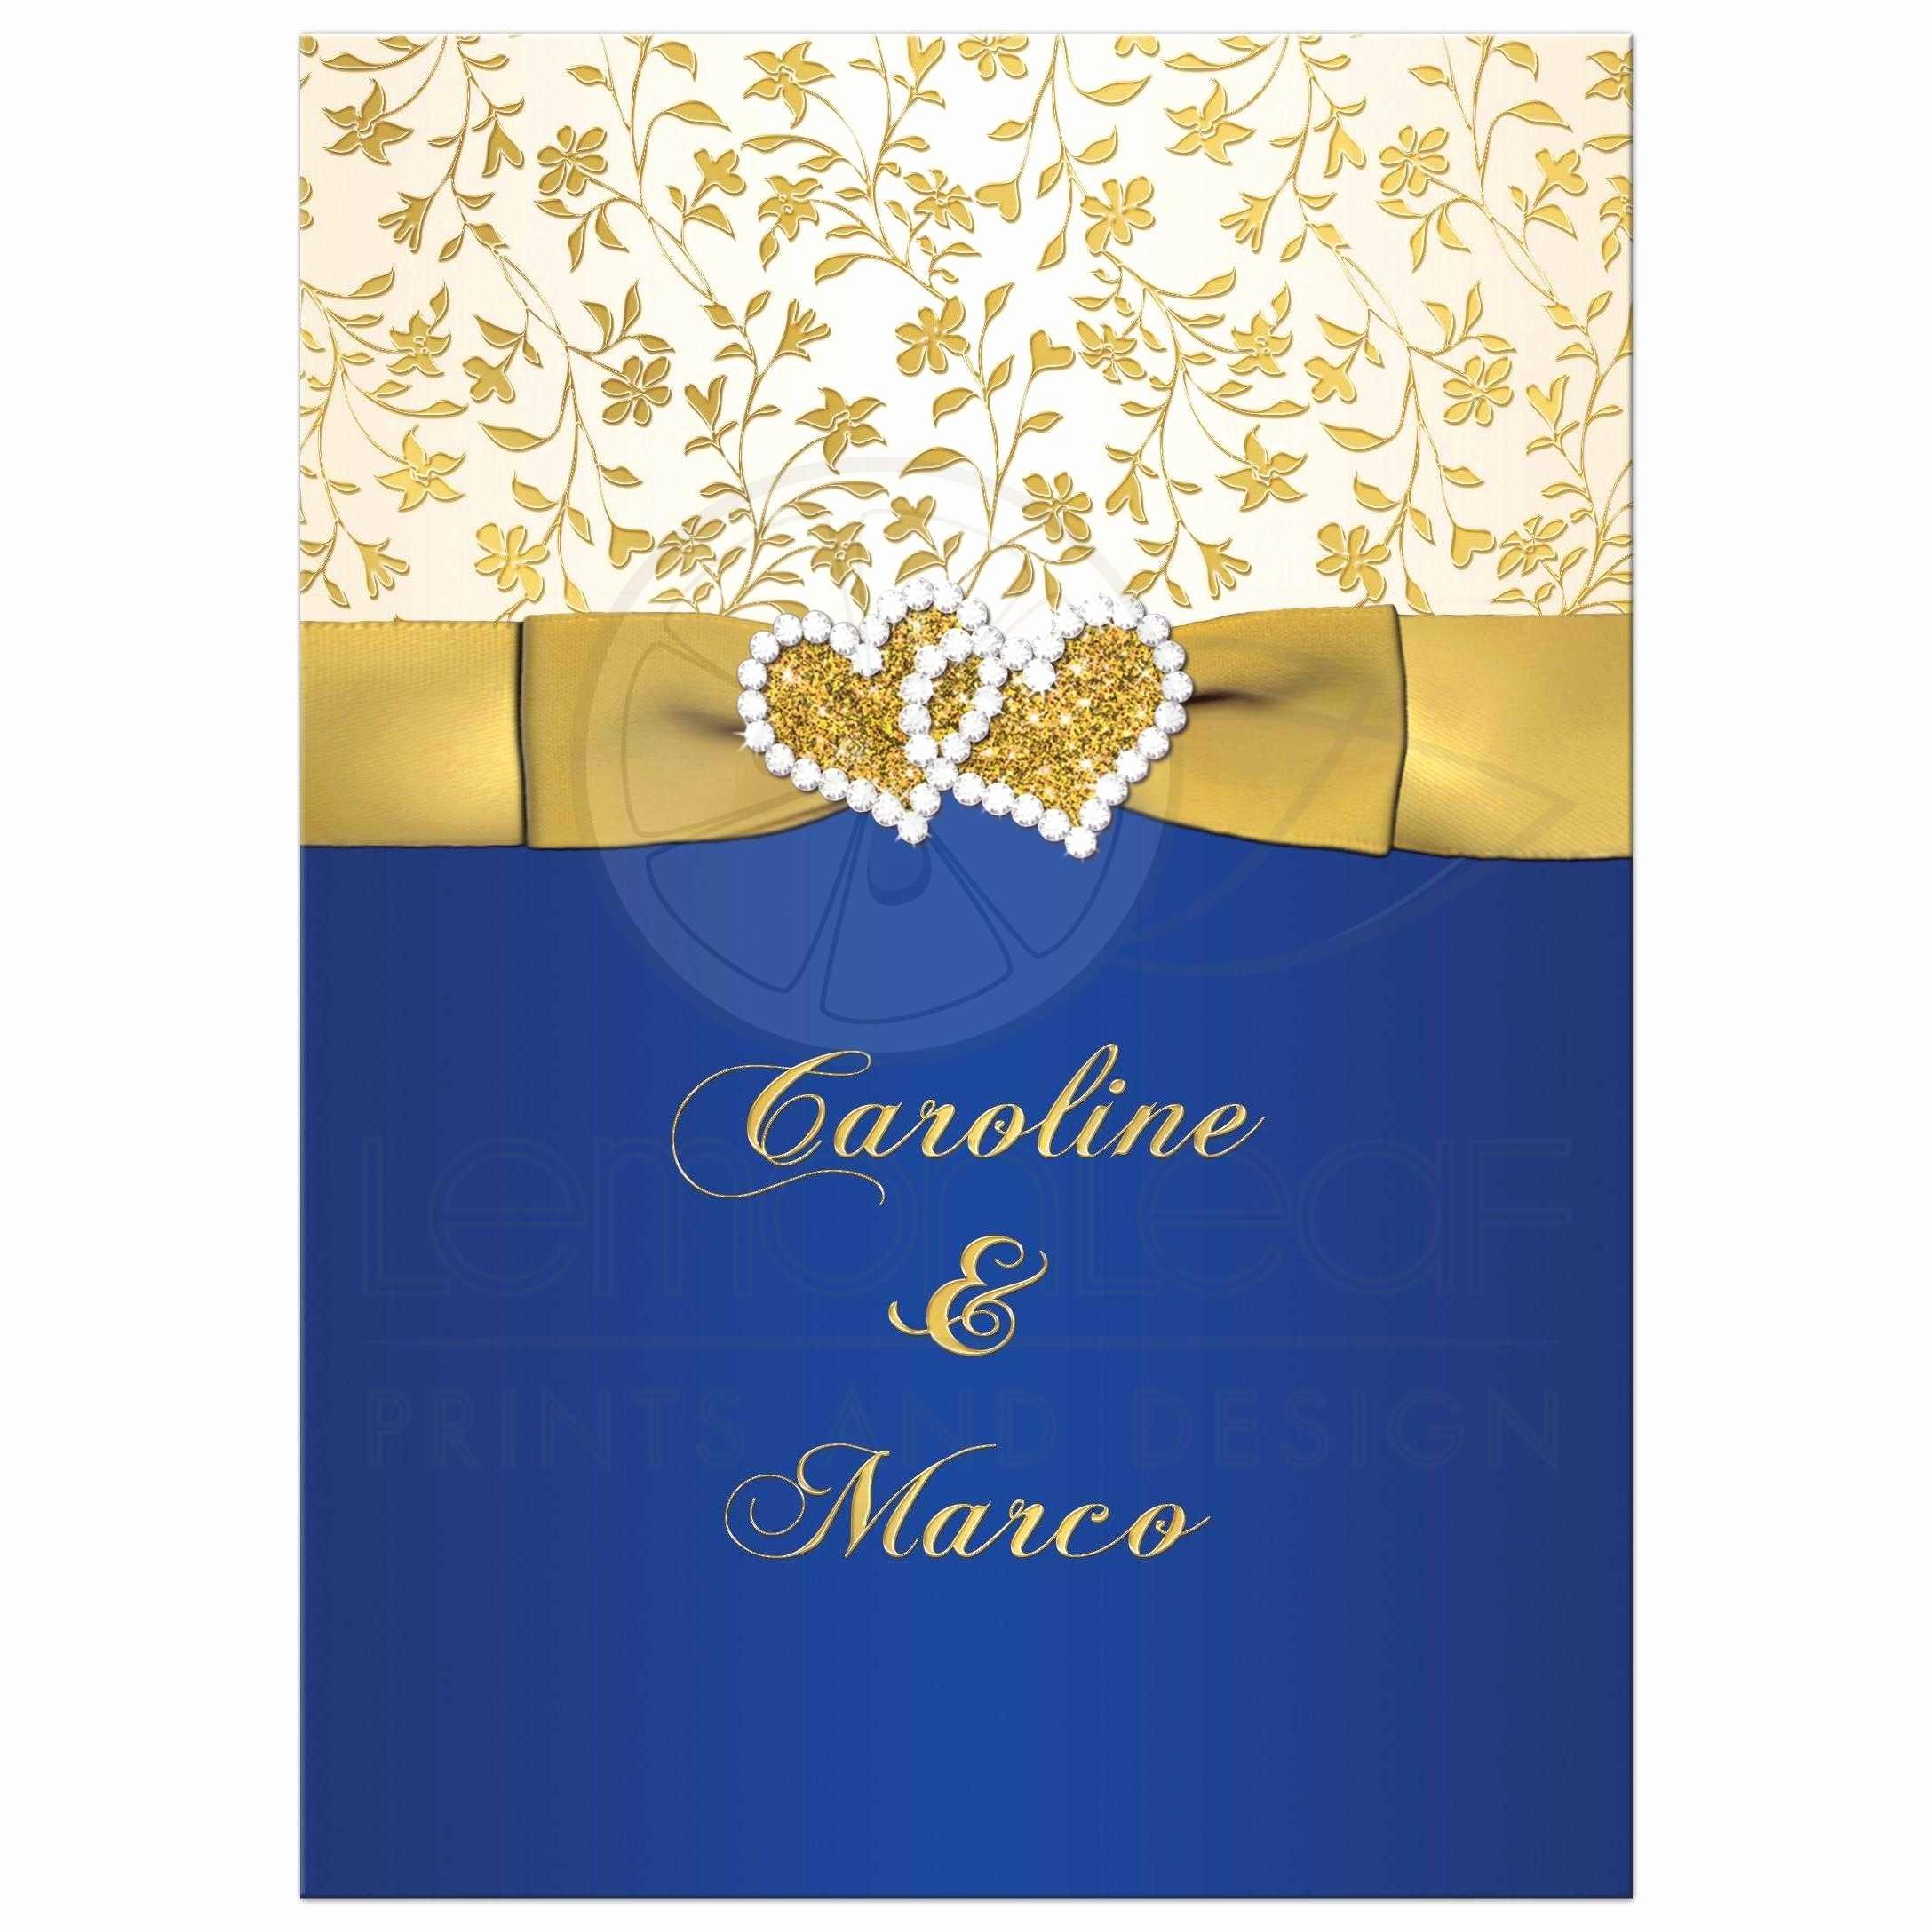 Blue and Gold Invitation Template Luxury 40th Wedding Anniversary Invite